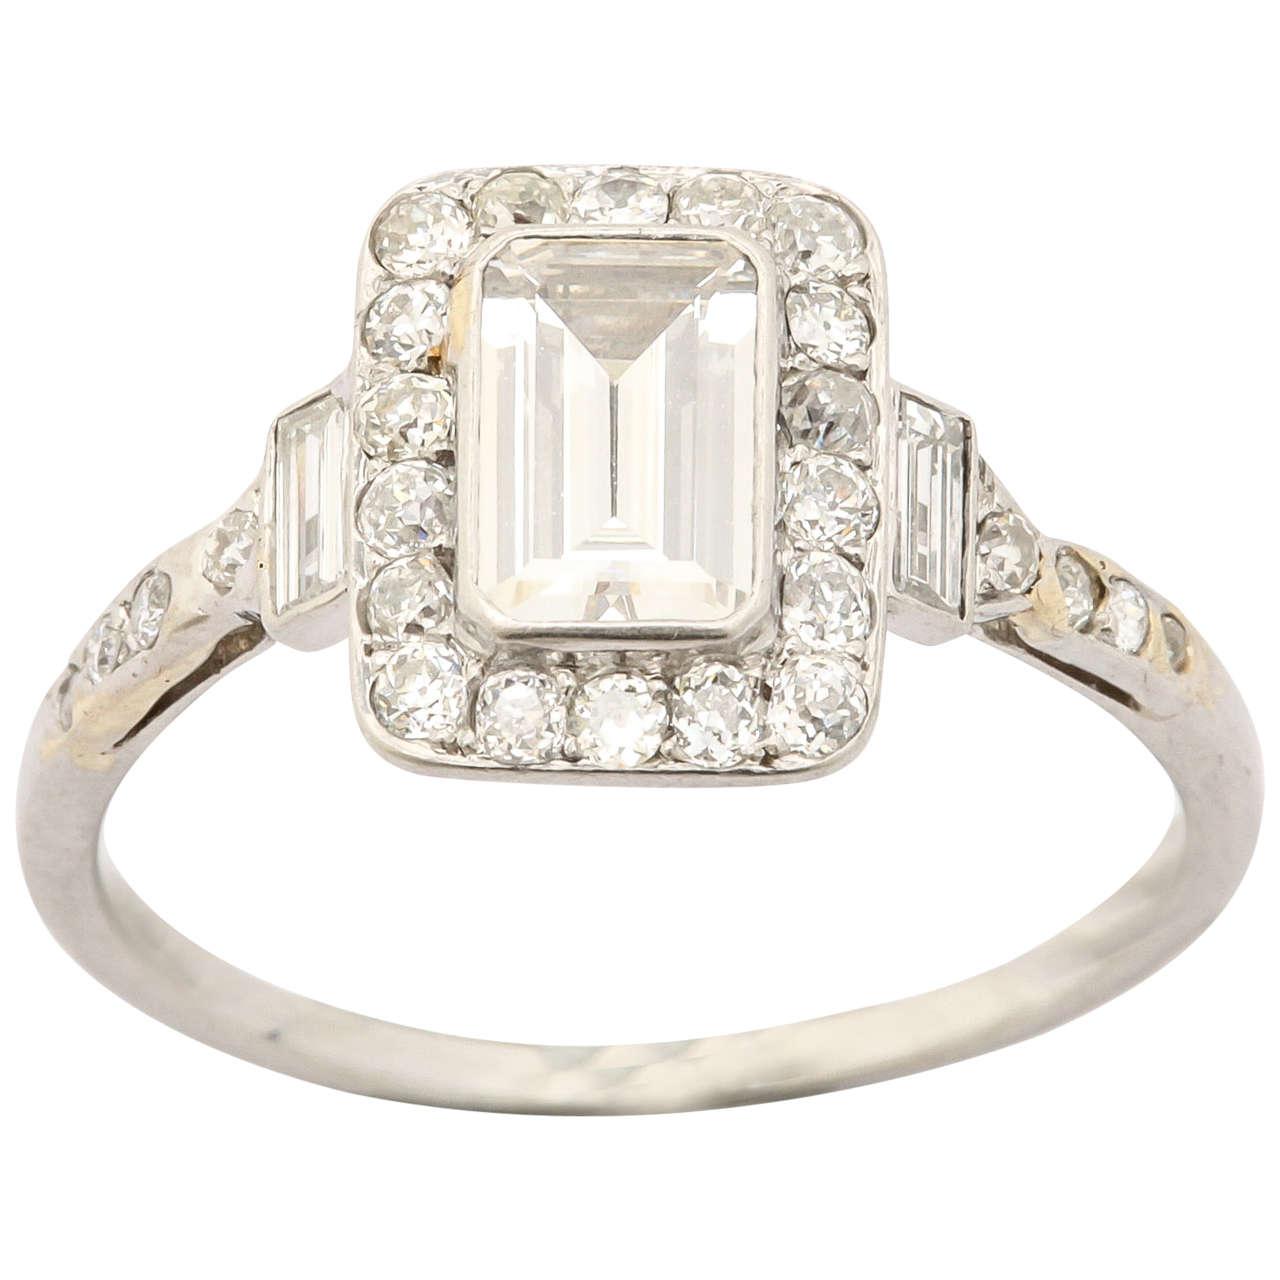 emerald cut diamond platinum ring for sale at 1stdibs. Black Bedroom Furniture Sets. Home Design Ideas